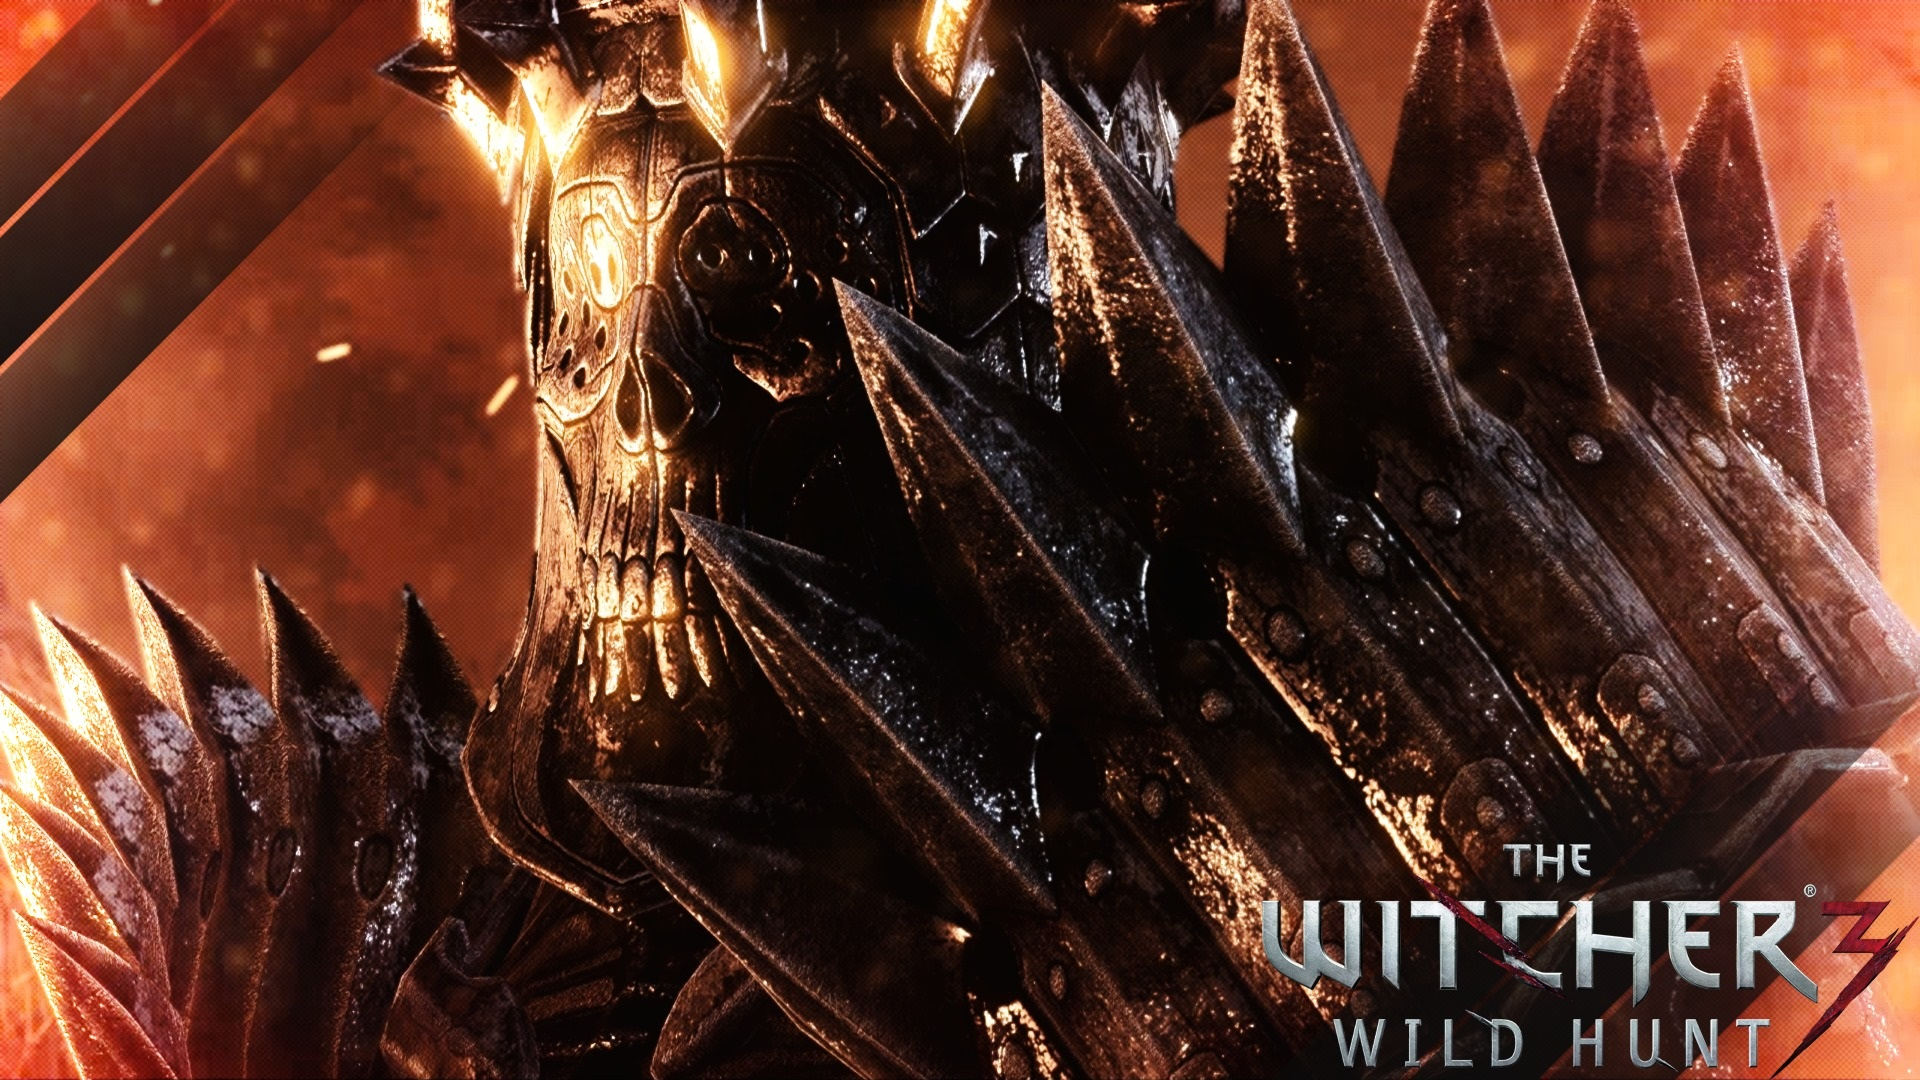 Fondos De Pantalla The Witcher 3 Wild Hunt Juegos De Ps4